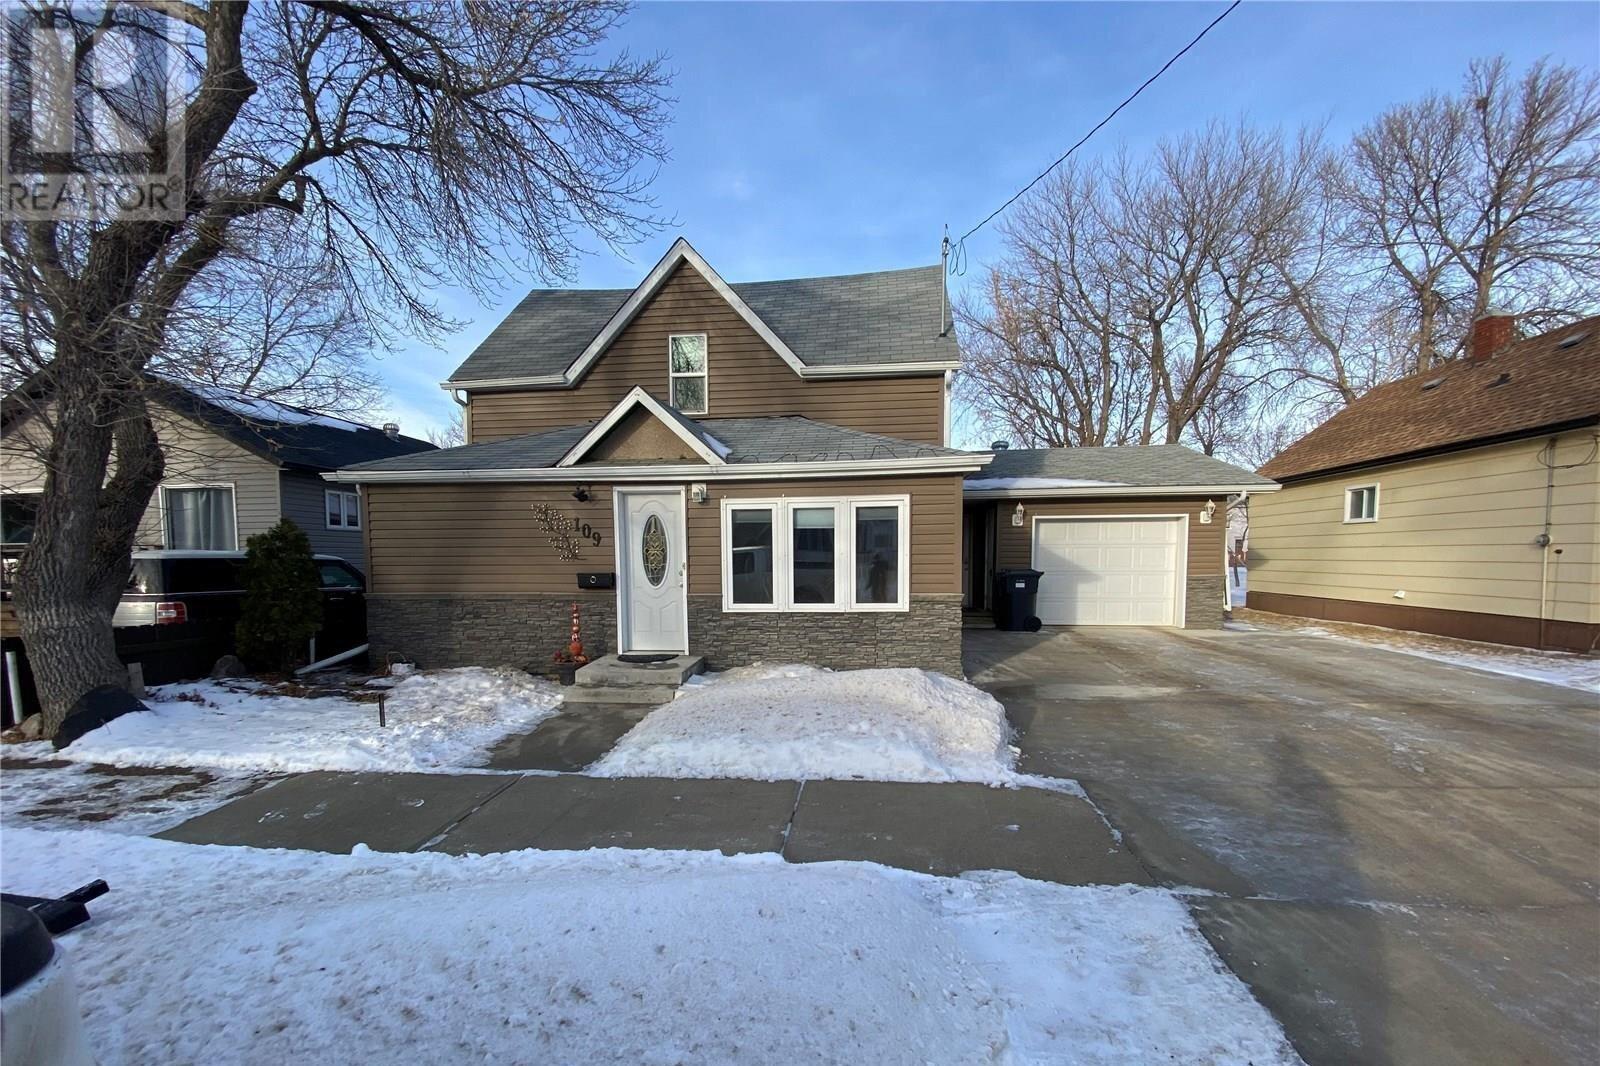 House for sale at 109 3rd Ave S Weyburn Saskatchewan - MLS: SK838557